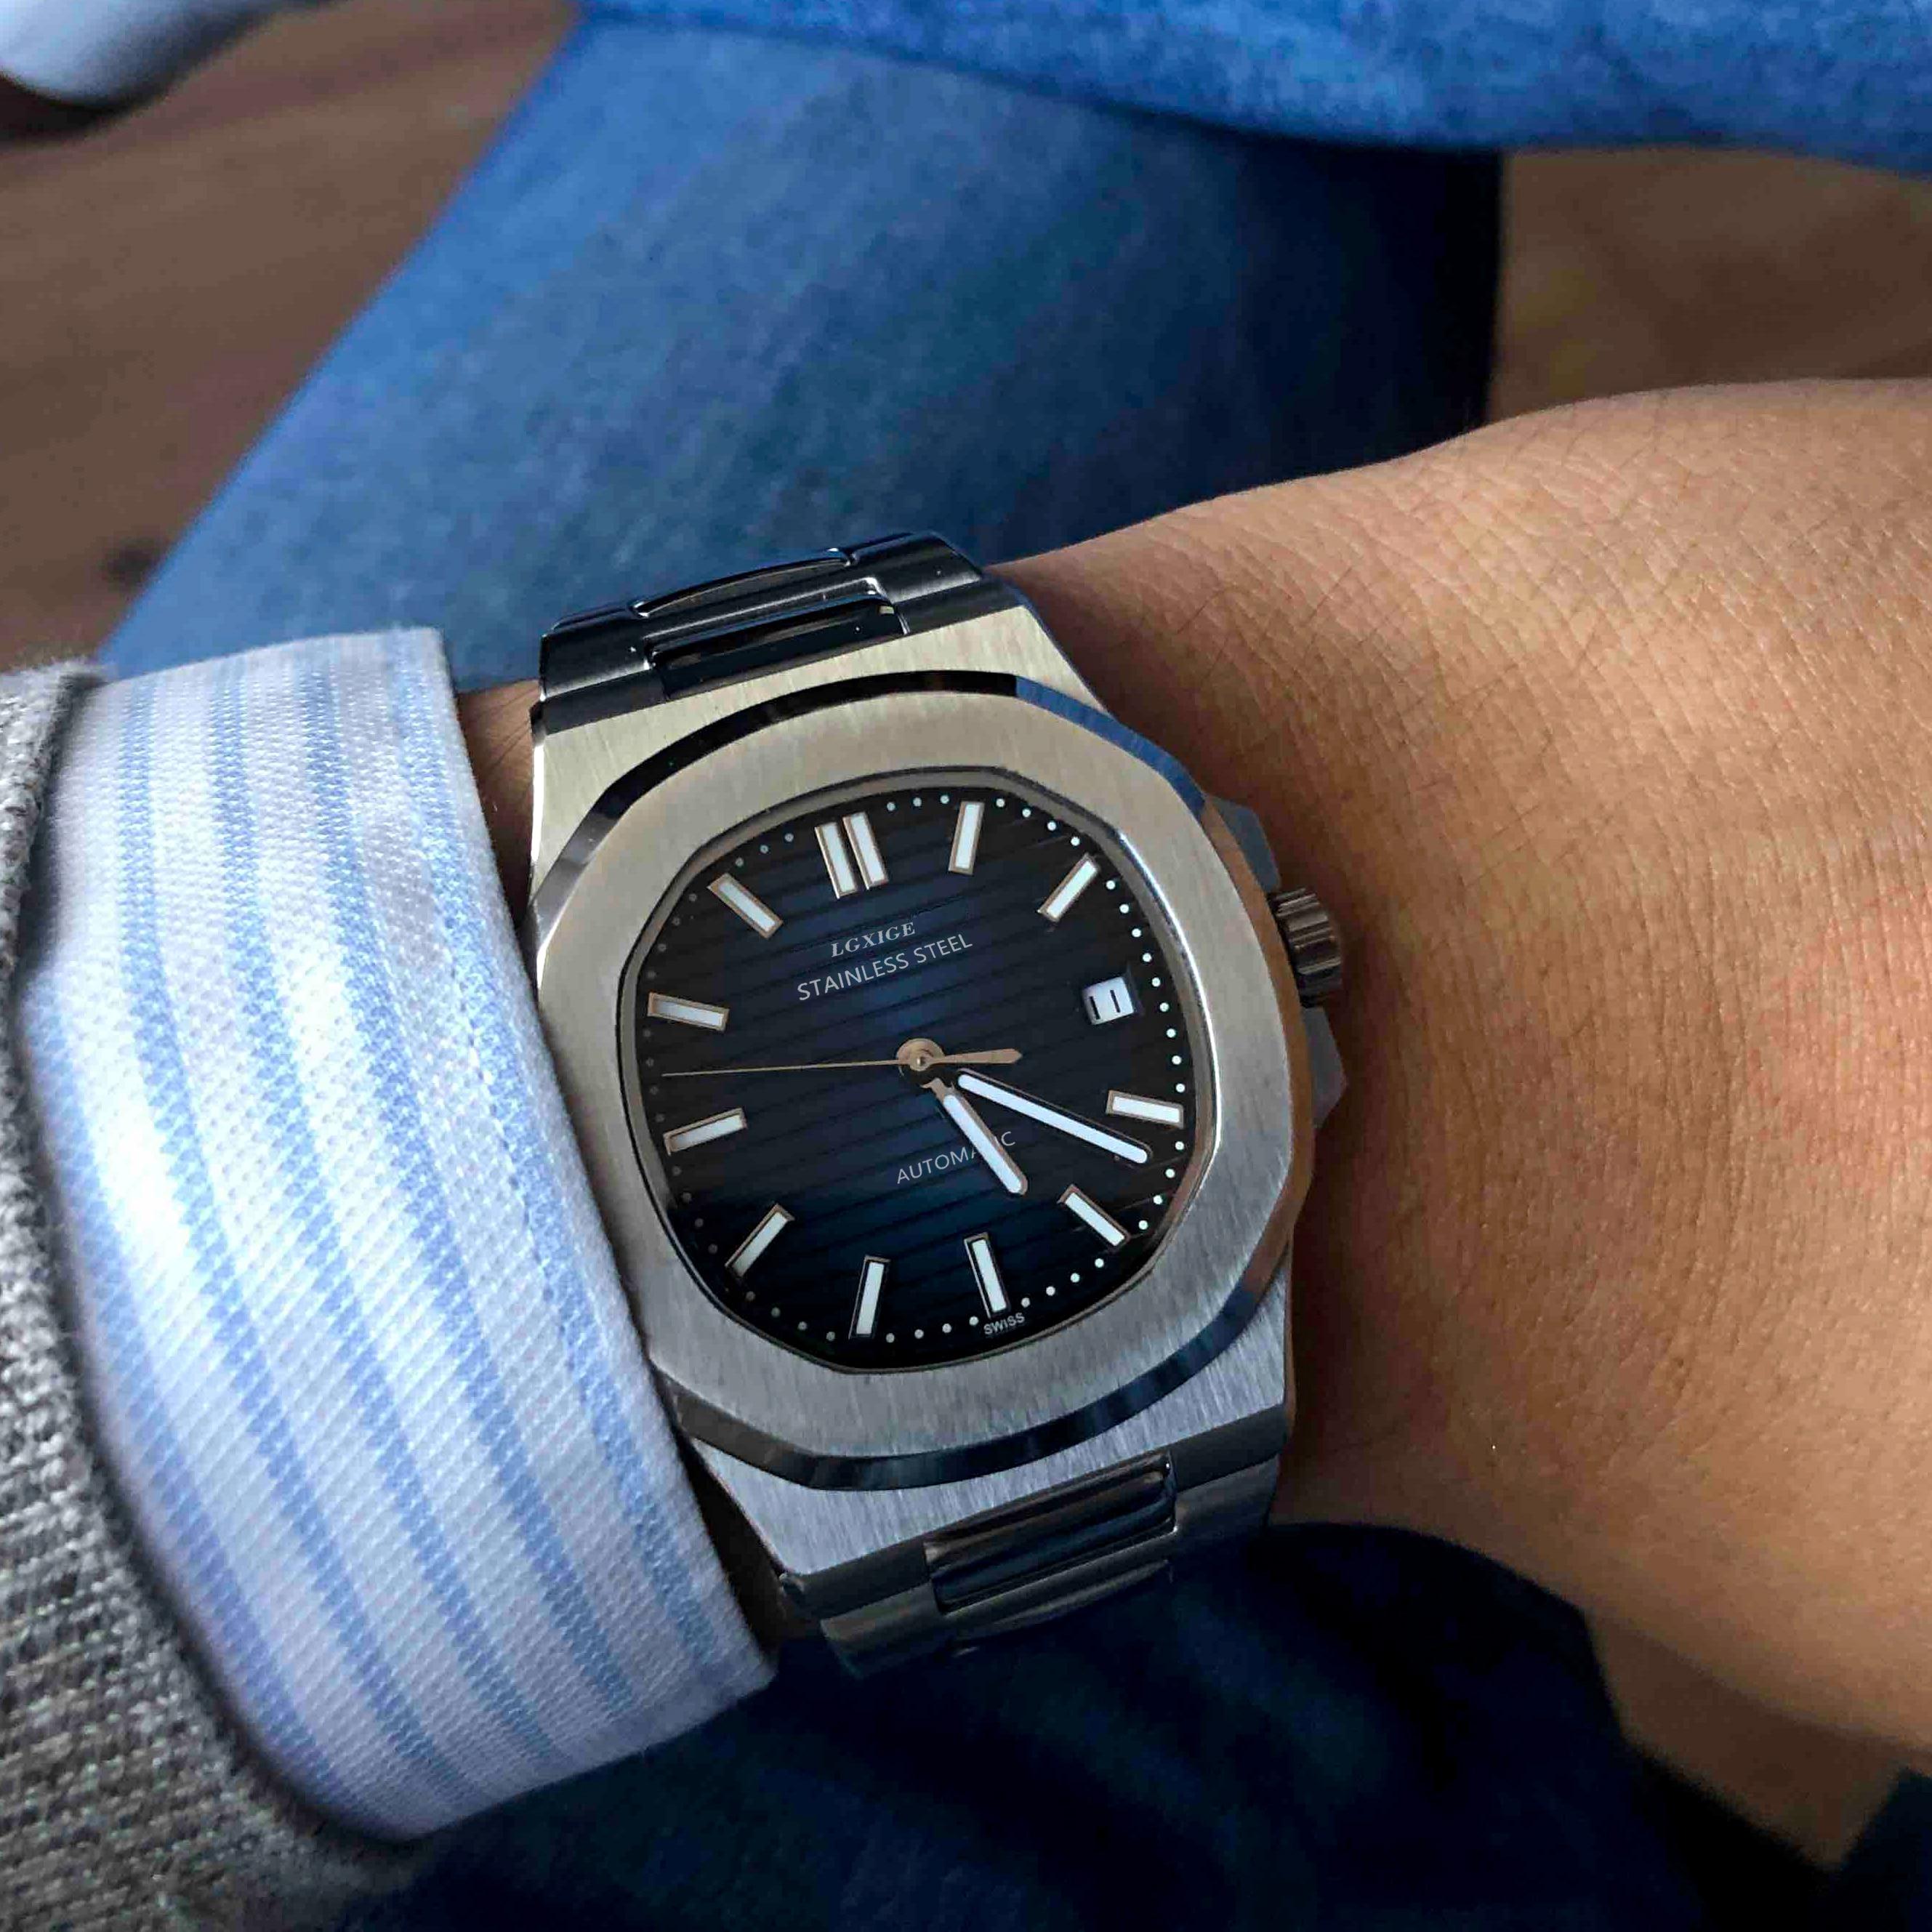 LGXIG Brand Men Watches Automatic Mechanical Watch JAPAN 8215 Sport Clock Casual Business Retro Wristwatch Relojes Hombre 2019 Pakistan